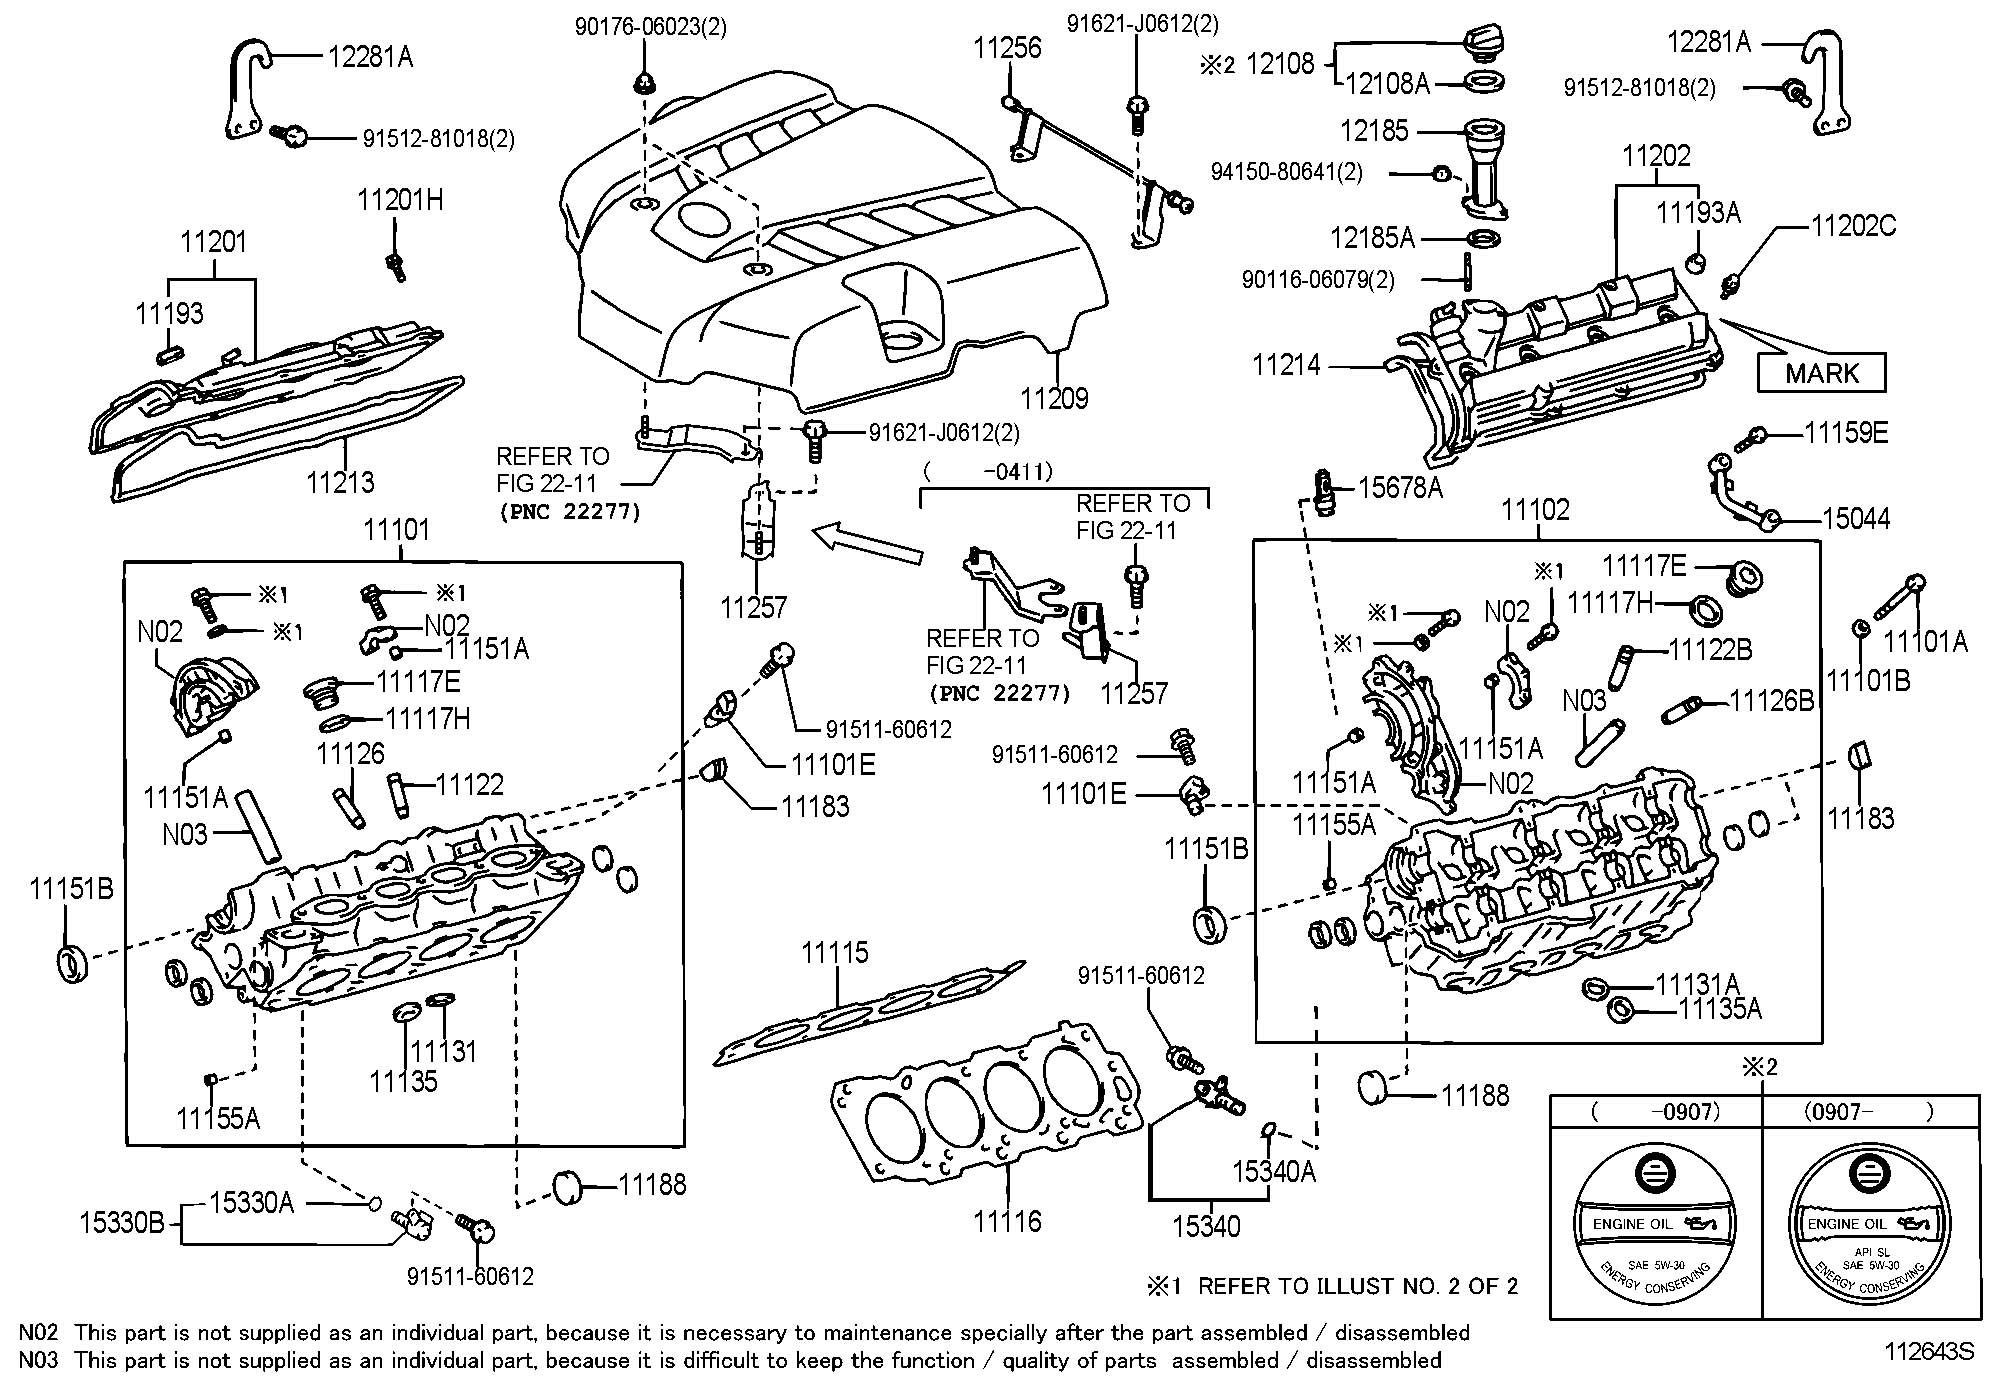 lexus rx330 engine diagram basic electronics wiring diagram 2007 Lexus RX 330 lexus rx330 engine diagram wiring diagramlexu rx330 engine diagram lexus rx 330 wiring diagram wiring librarylexus